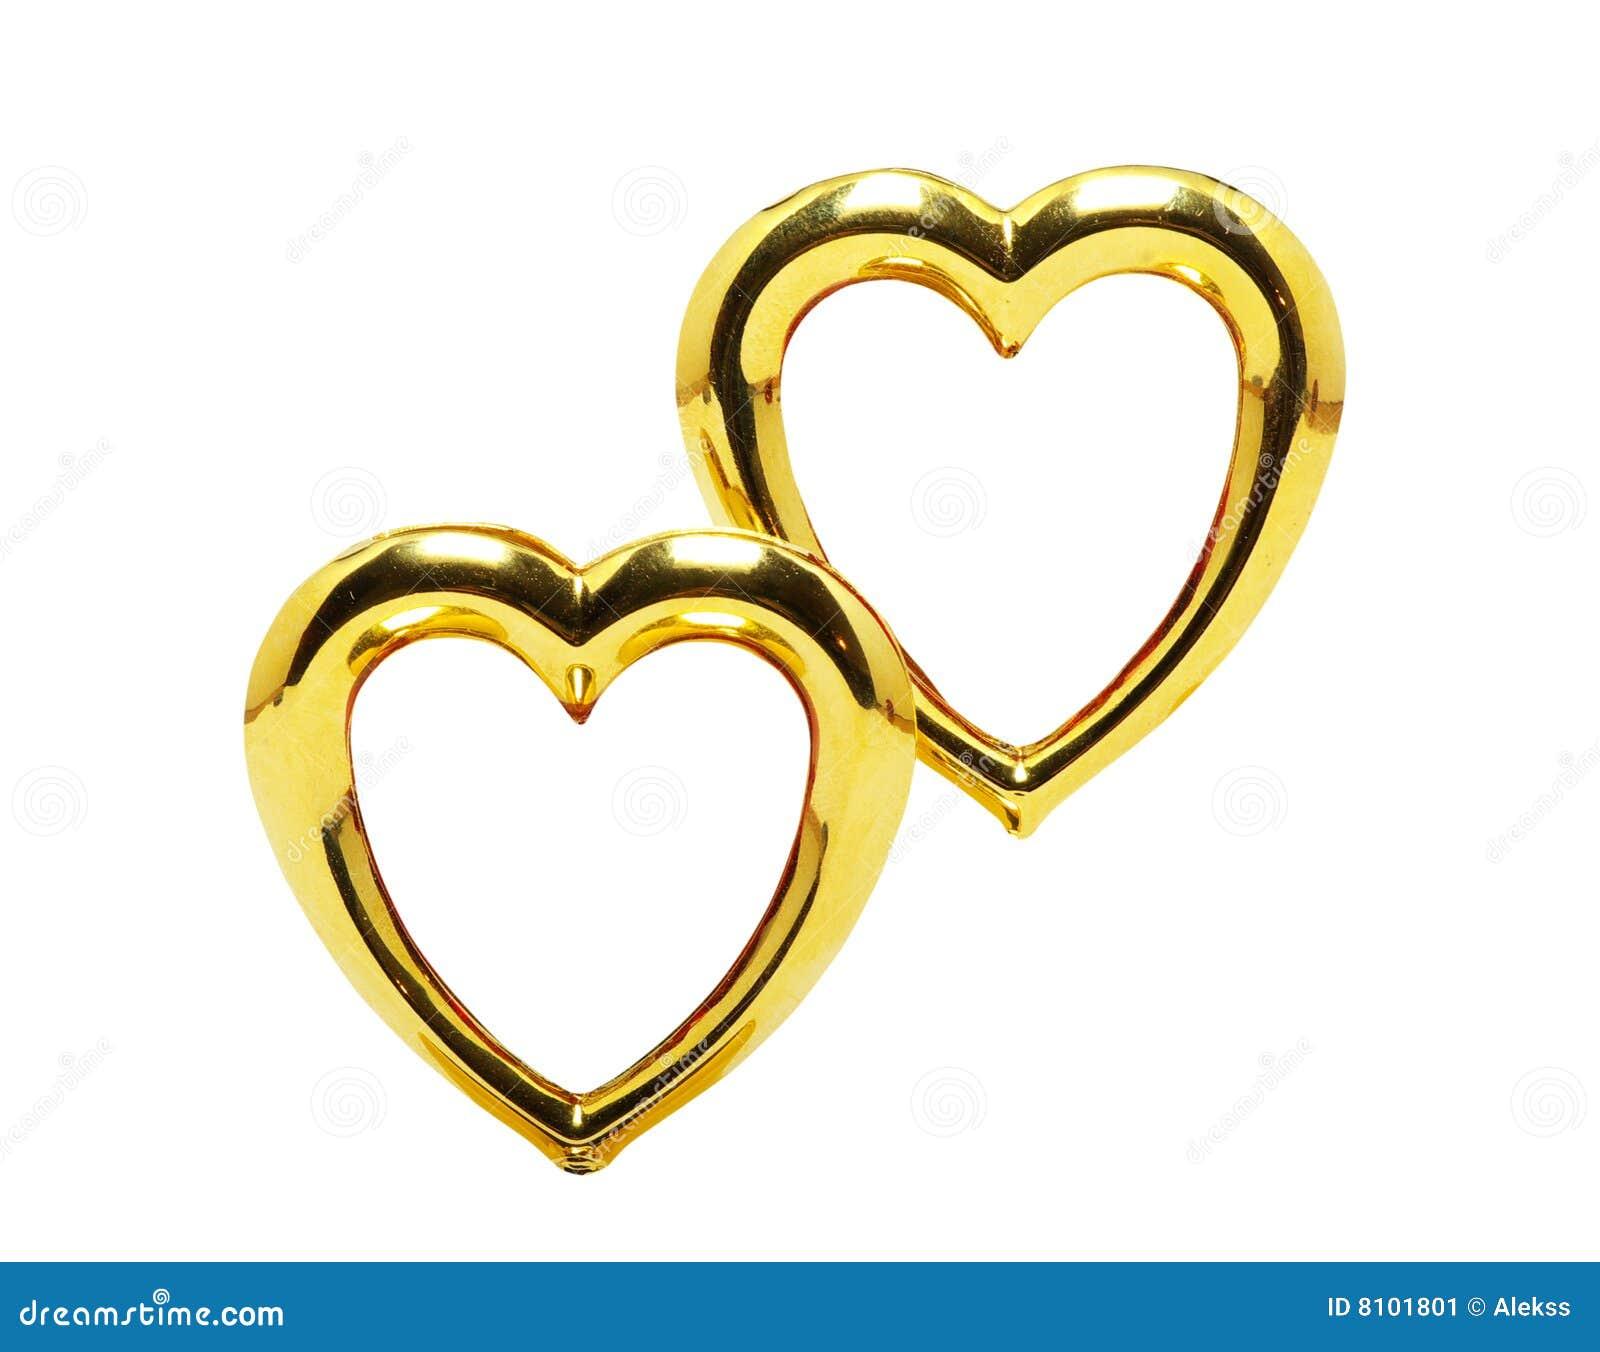 Golden wedding anniversary clip art